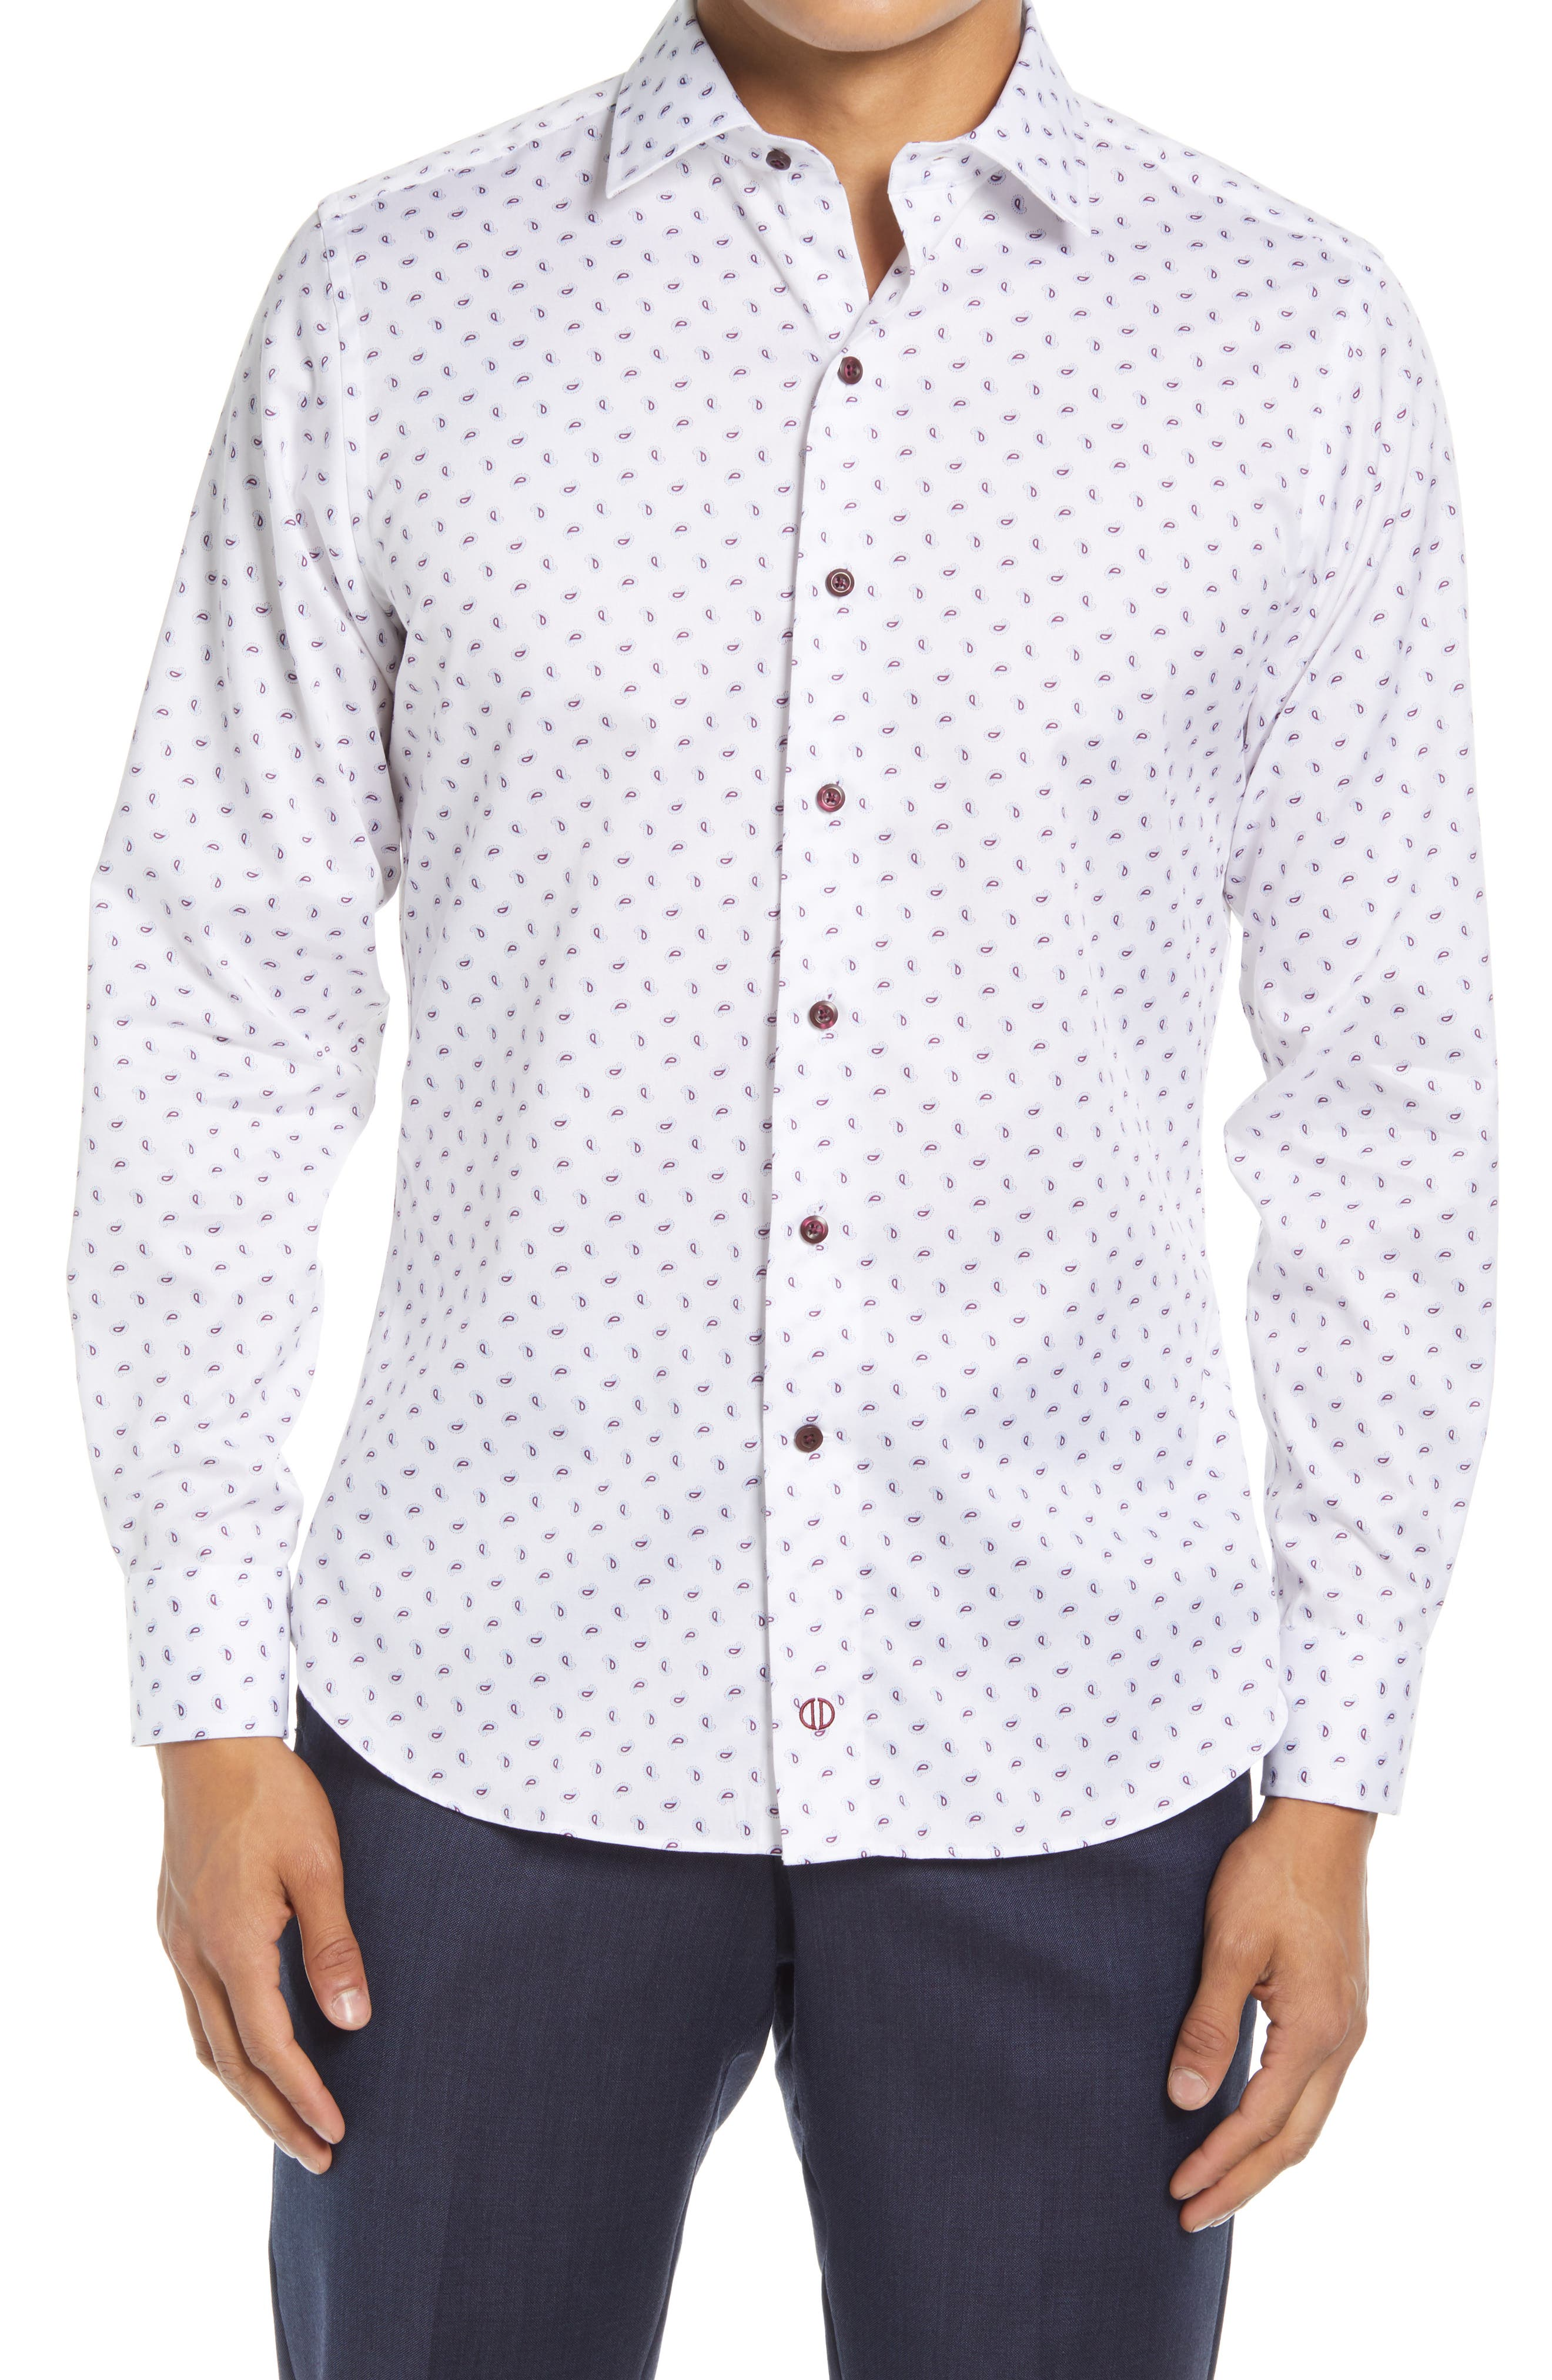 Fusion Paisley Dress Shirt